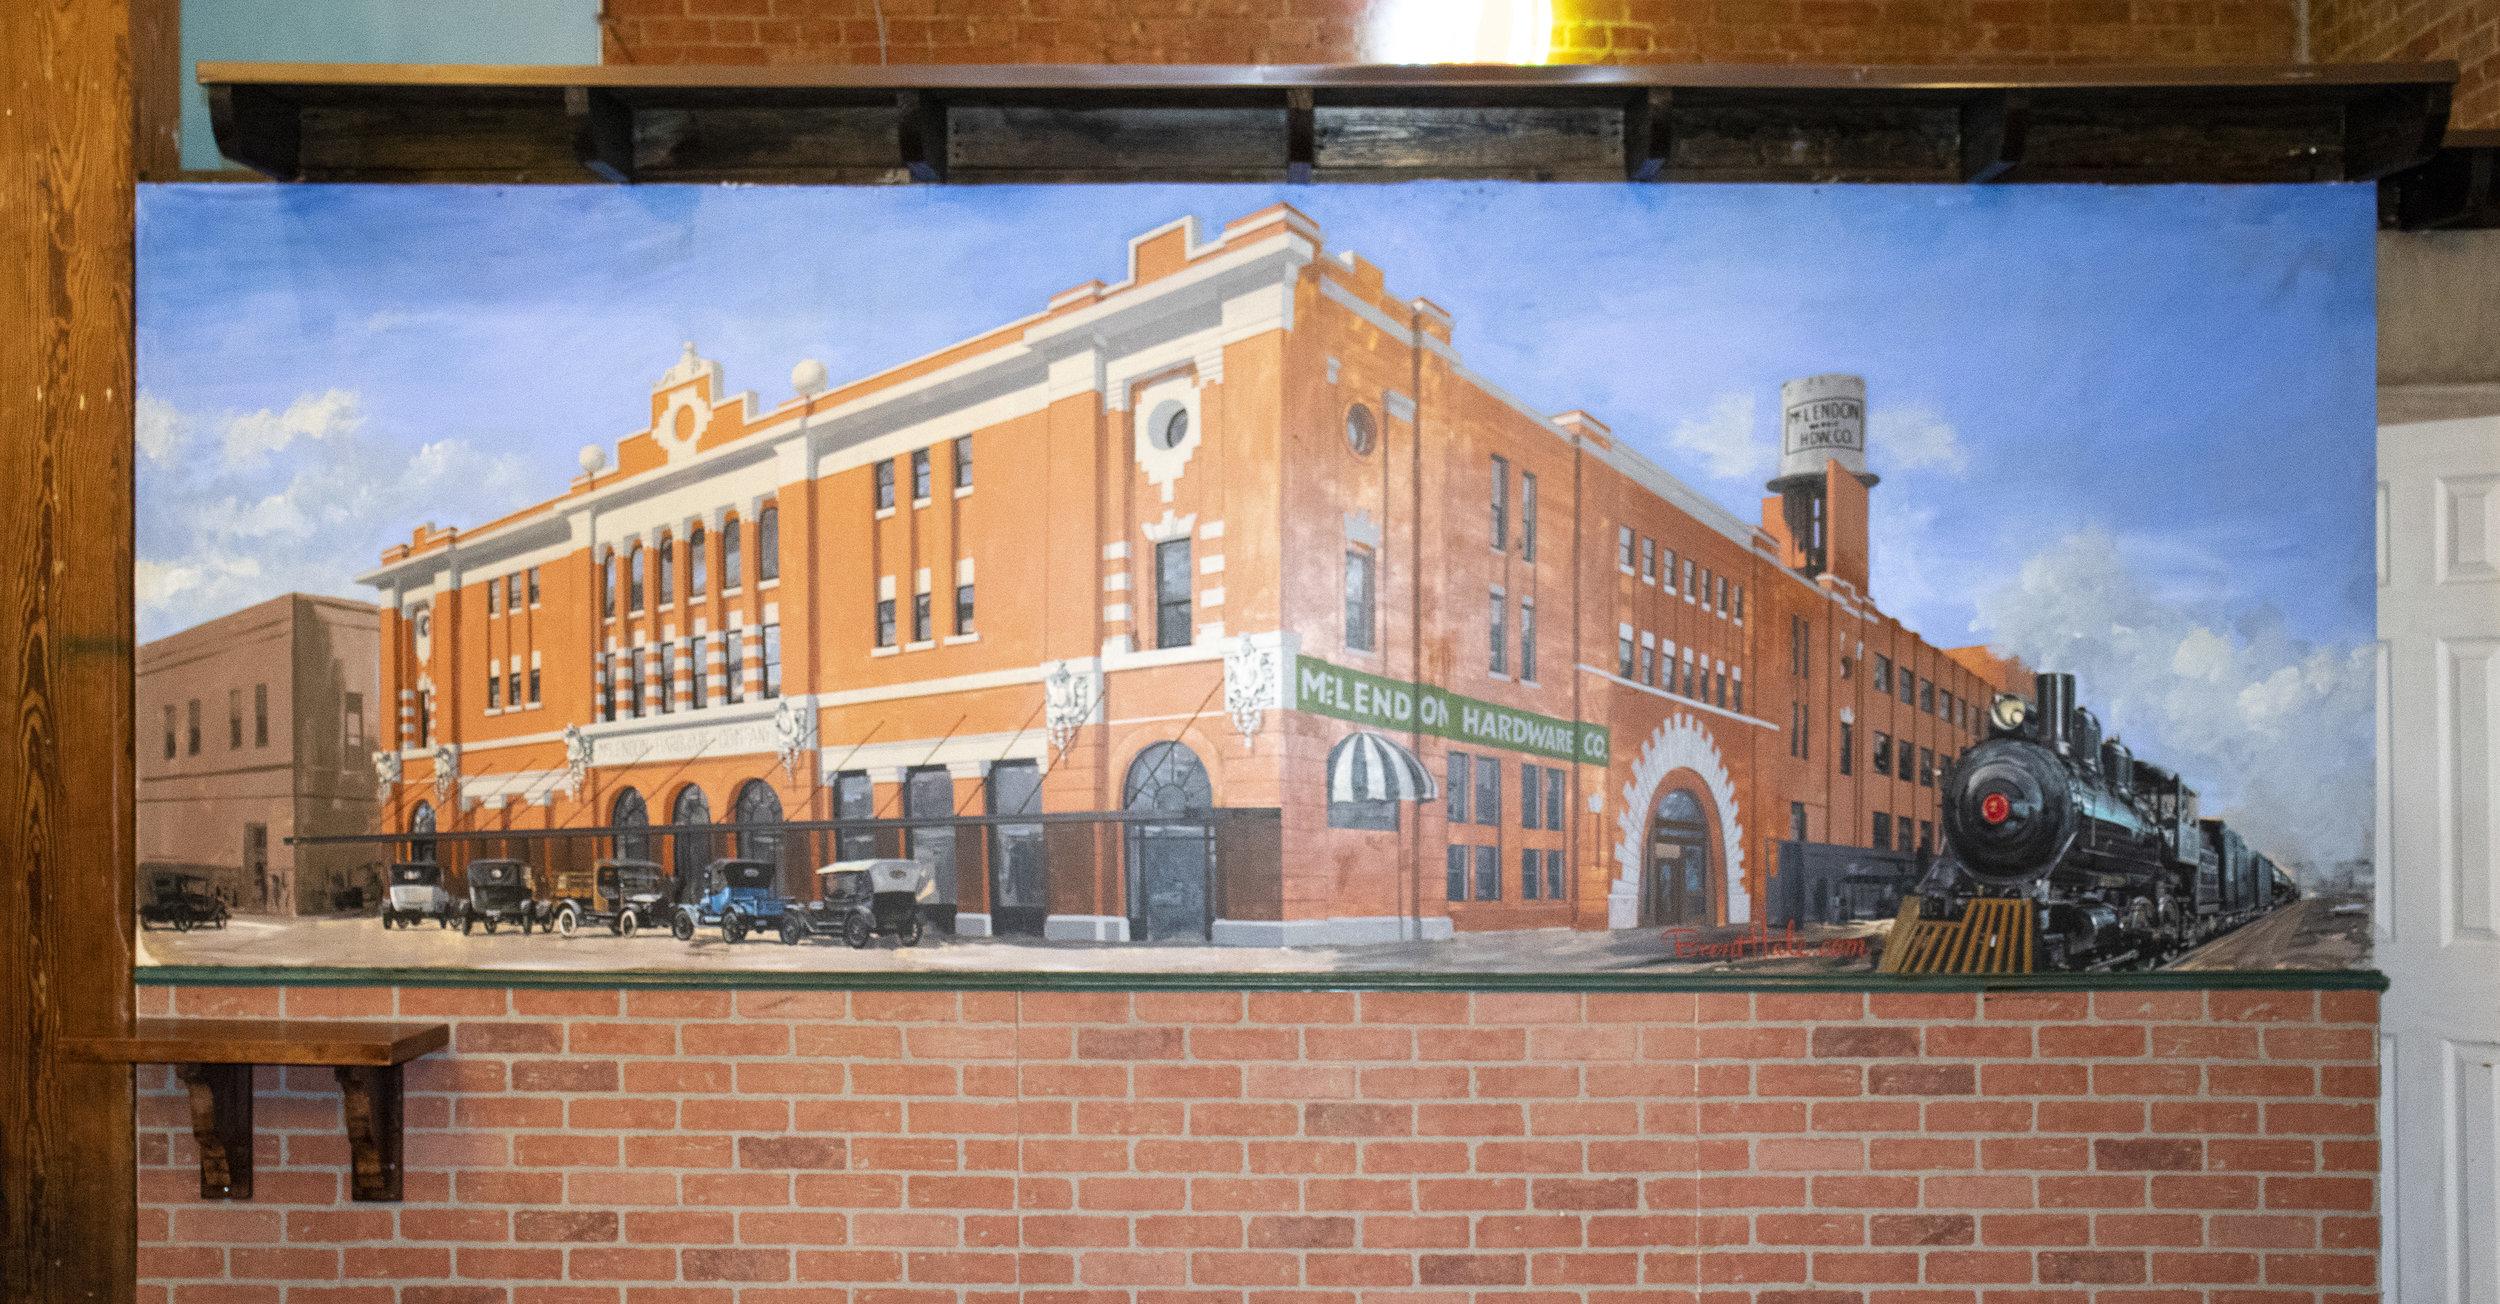 Nina's Restaurant Waco, TX - McLendon Bldg.